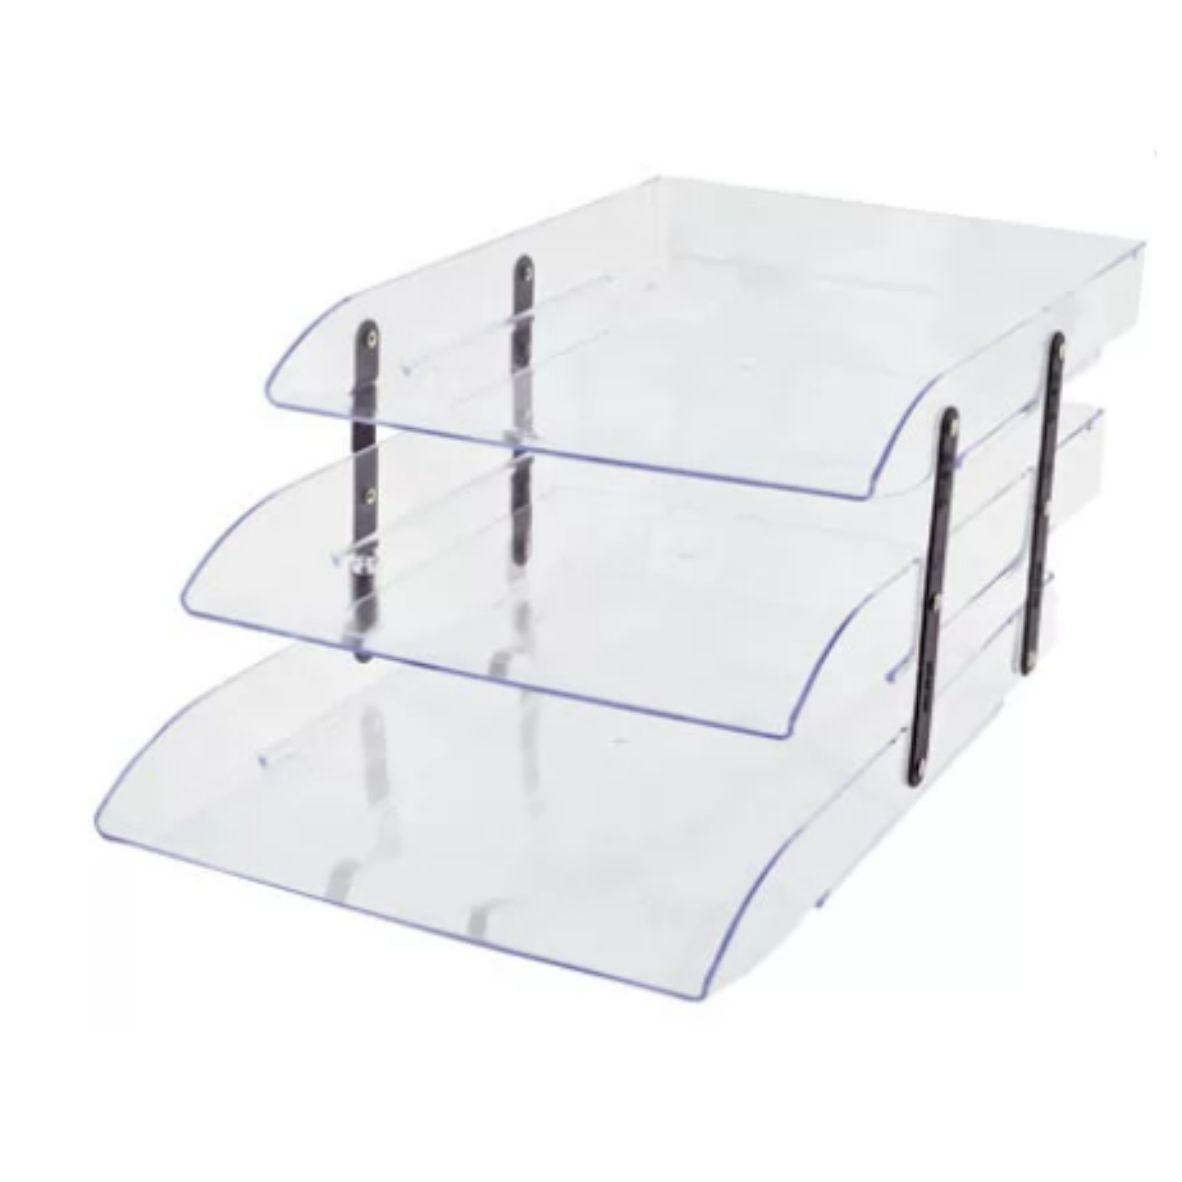 Caixa Correspondência Articulável Cristal Tripla - Dello